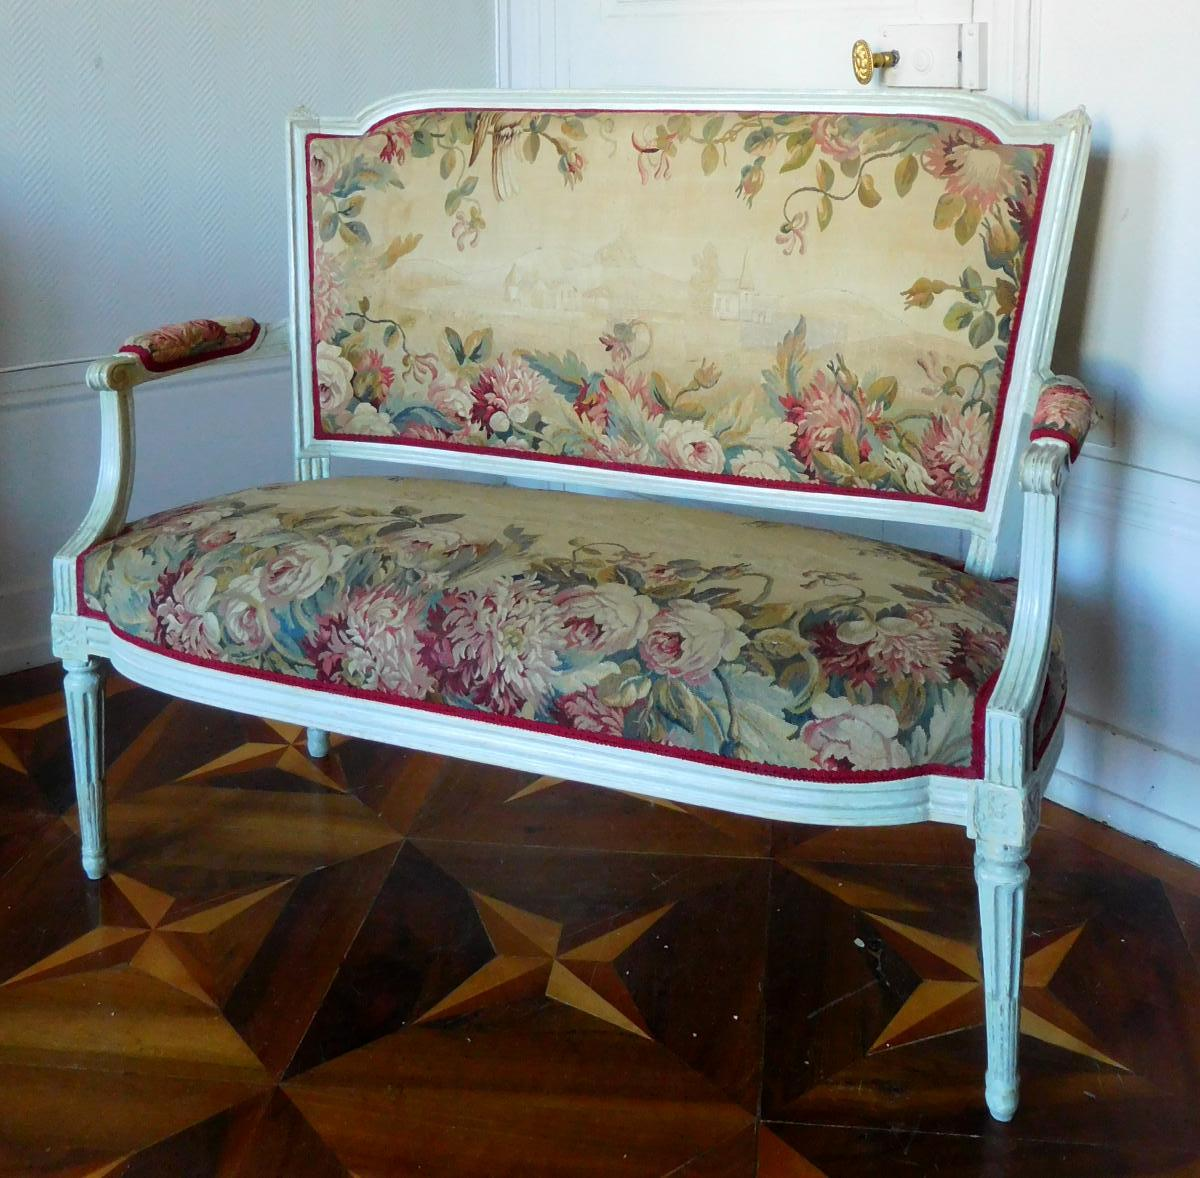 2 Seats Louis XVI Sofa With Aubusson Tapestry - Circa 1780